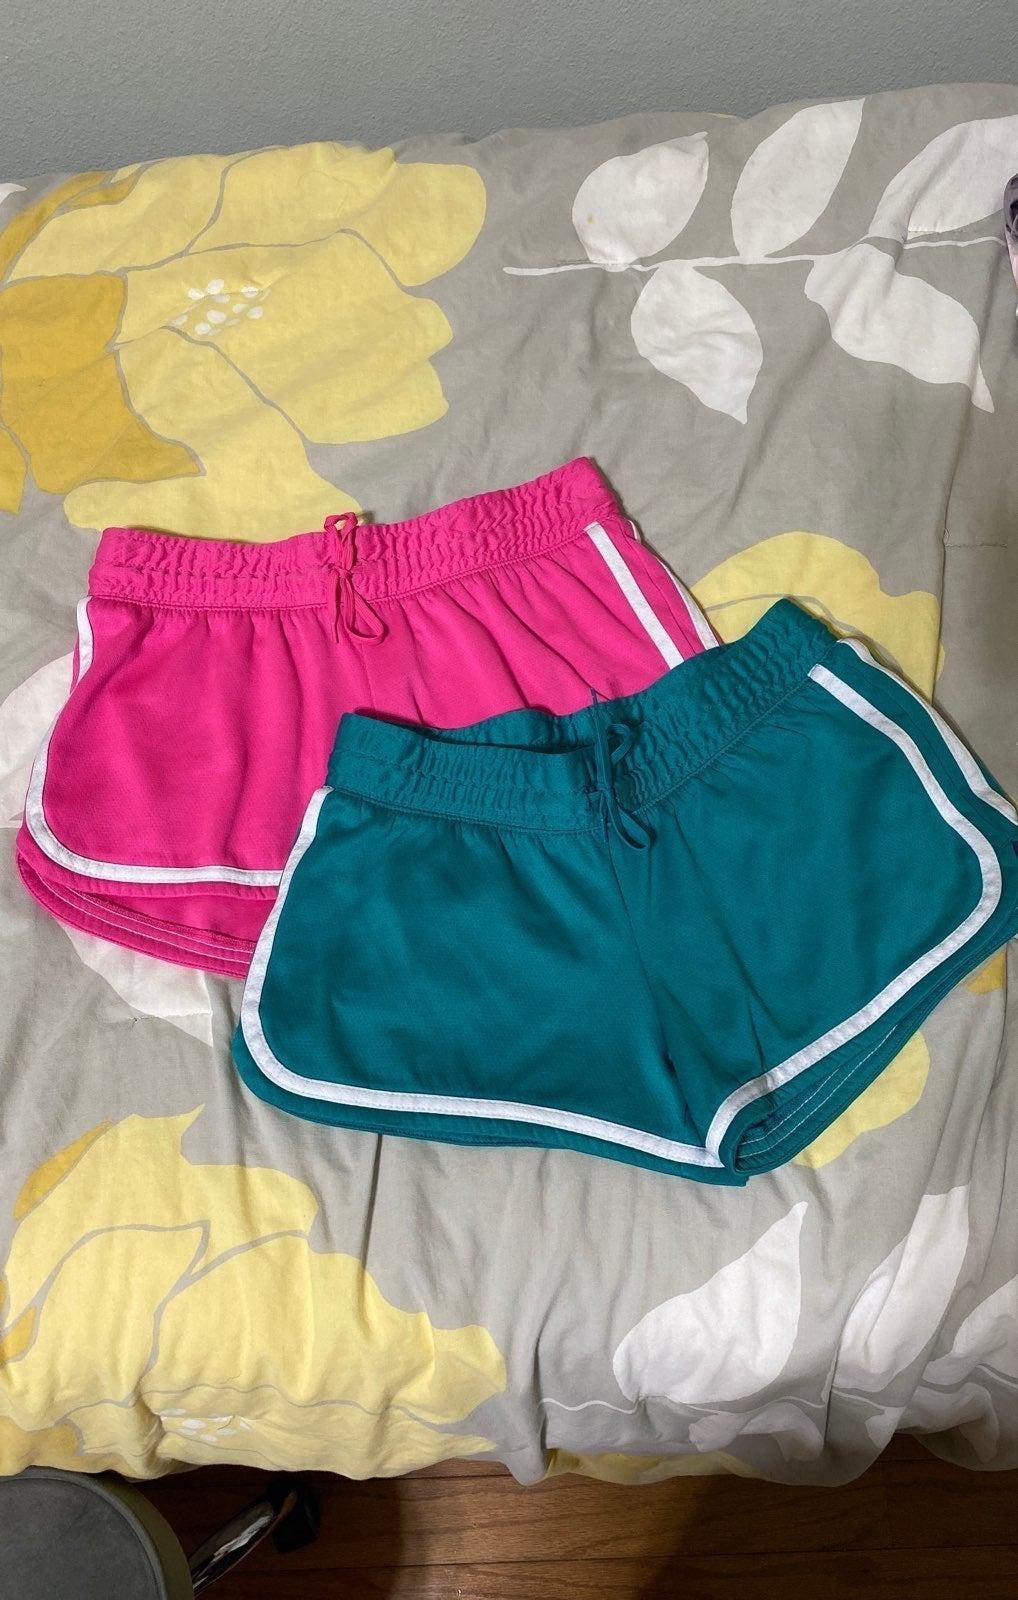 Bundle of 2 BCG Workout Shorts